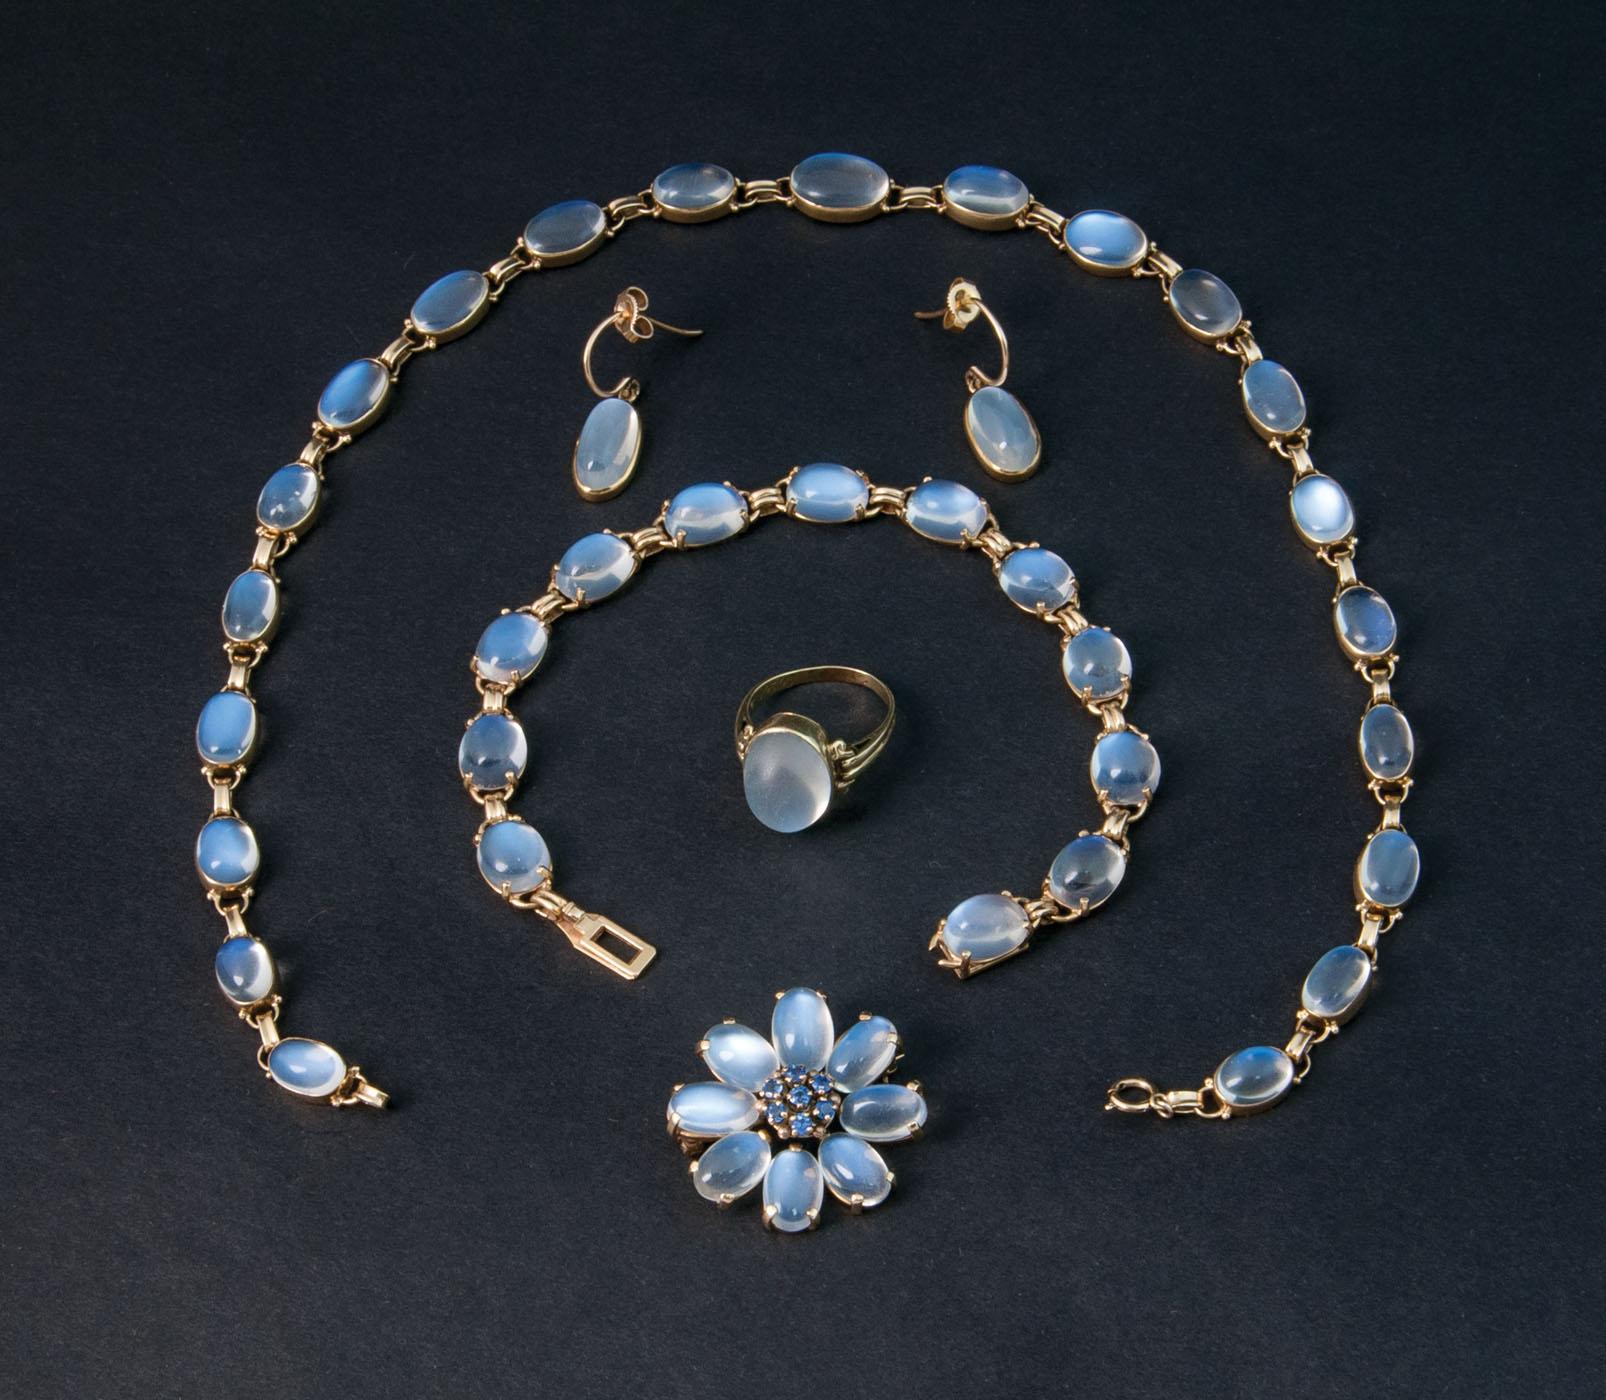 moonstone jewelry gold - photo #17